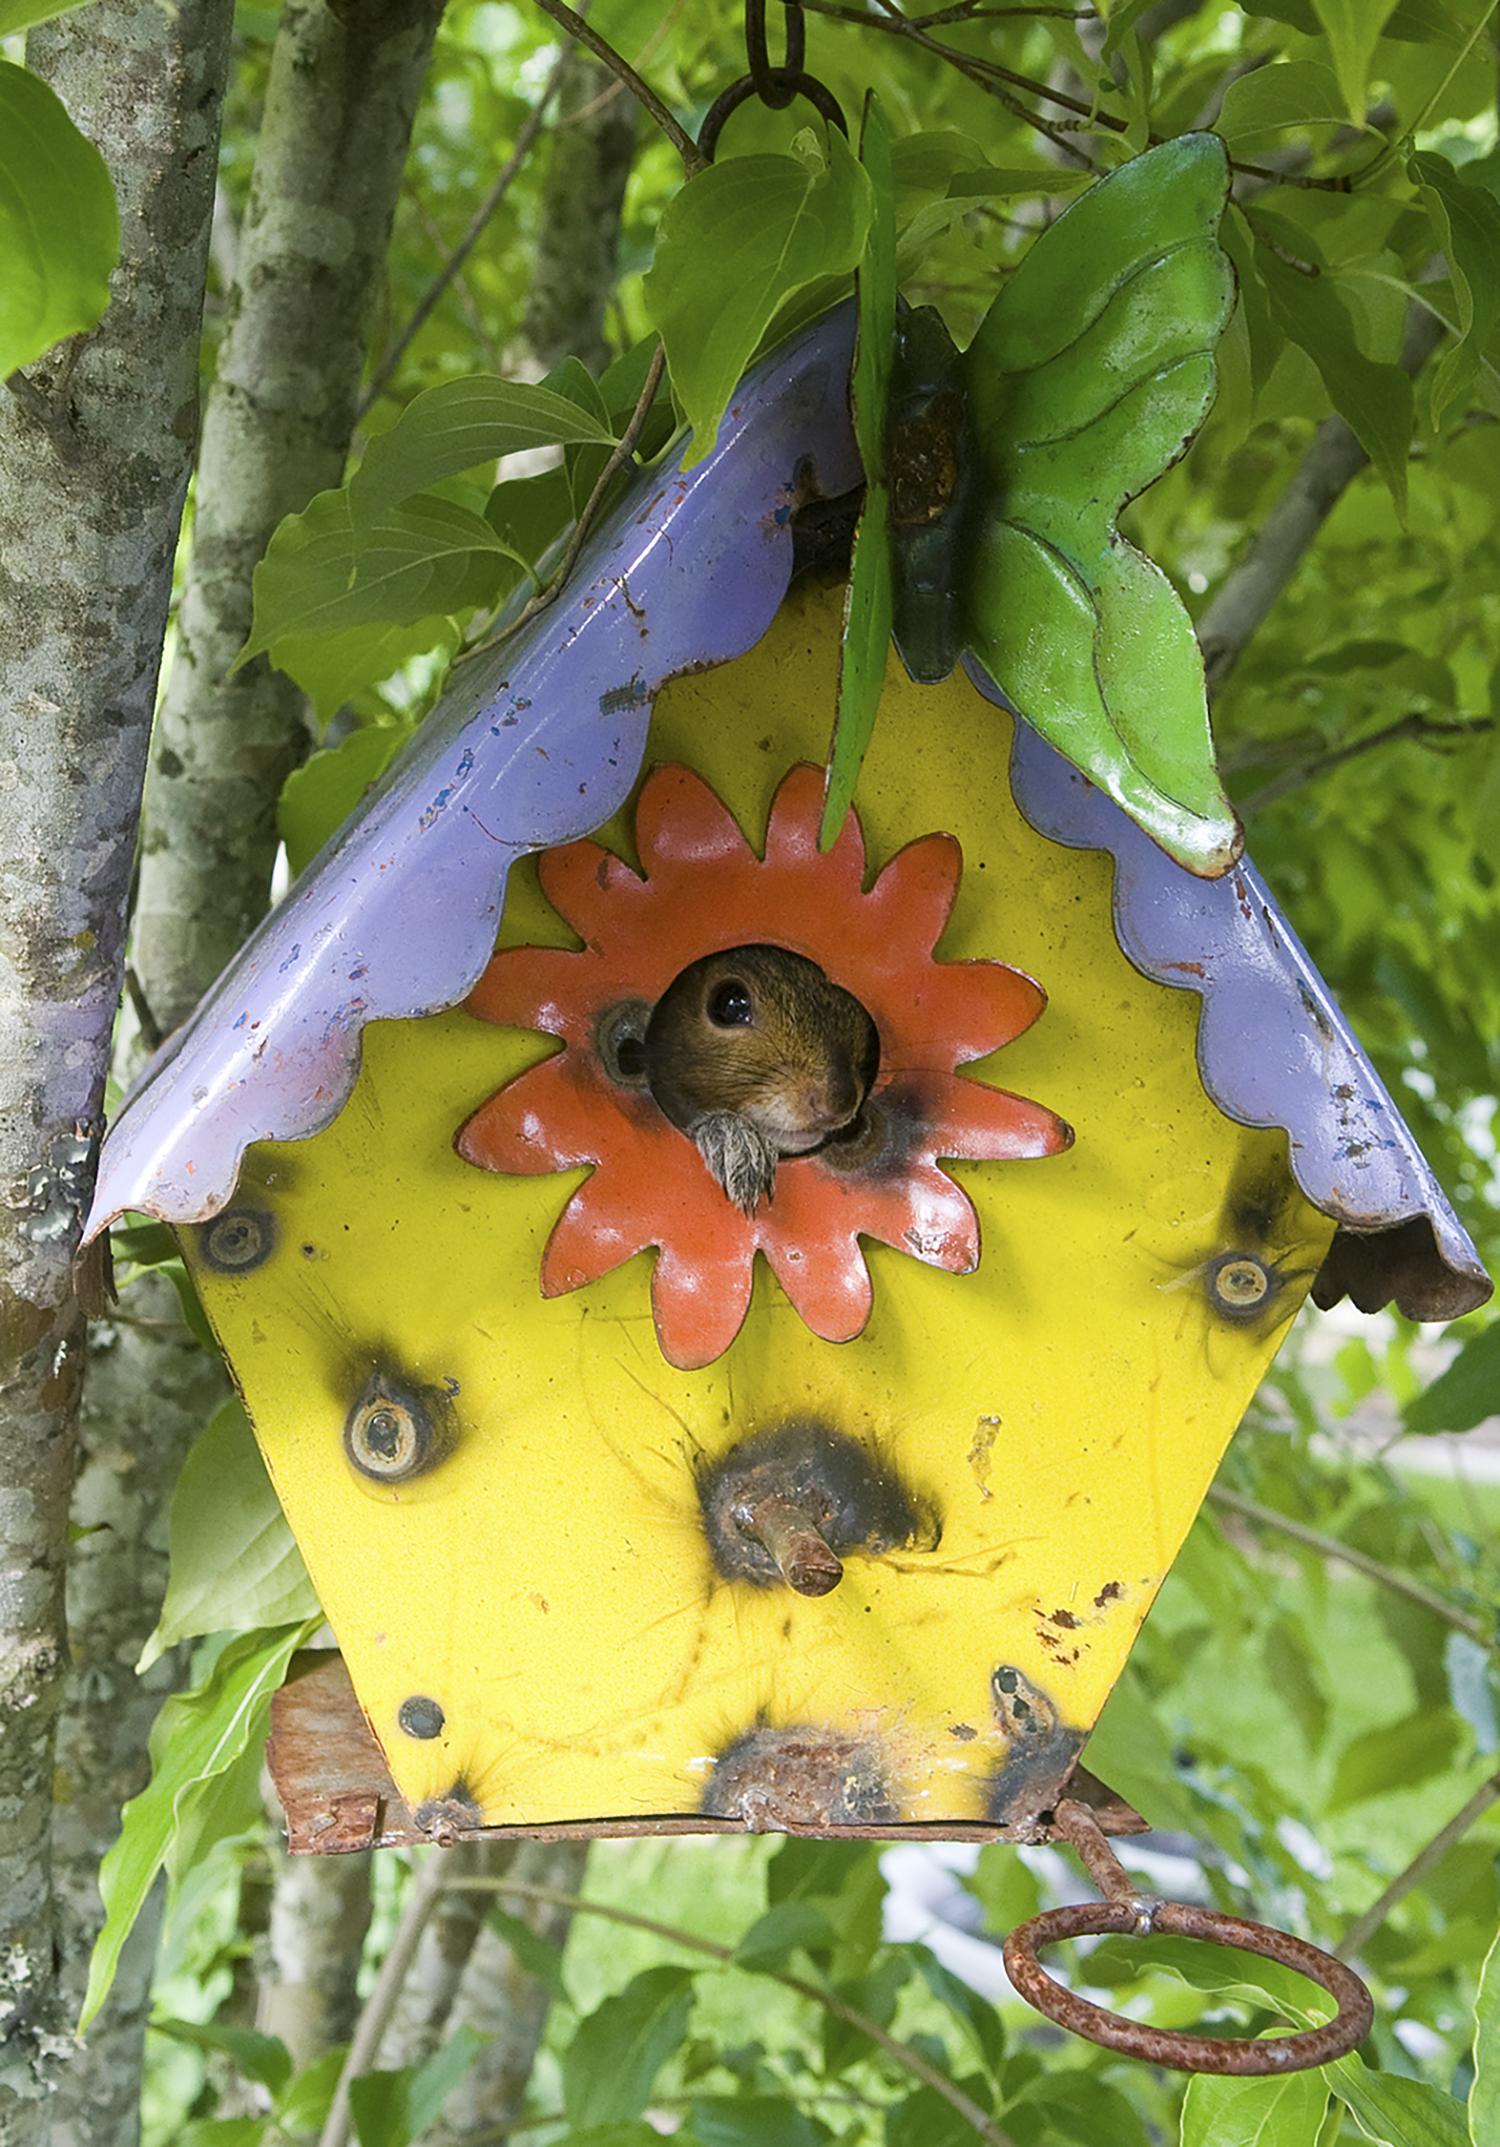 Squirrel-Wildlife-Sanctuary-Birdhouse.jpg